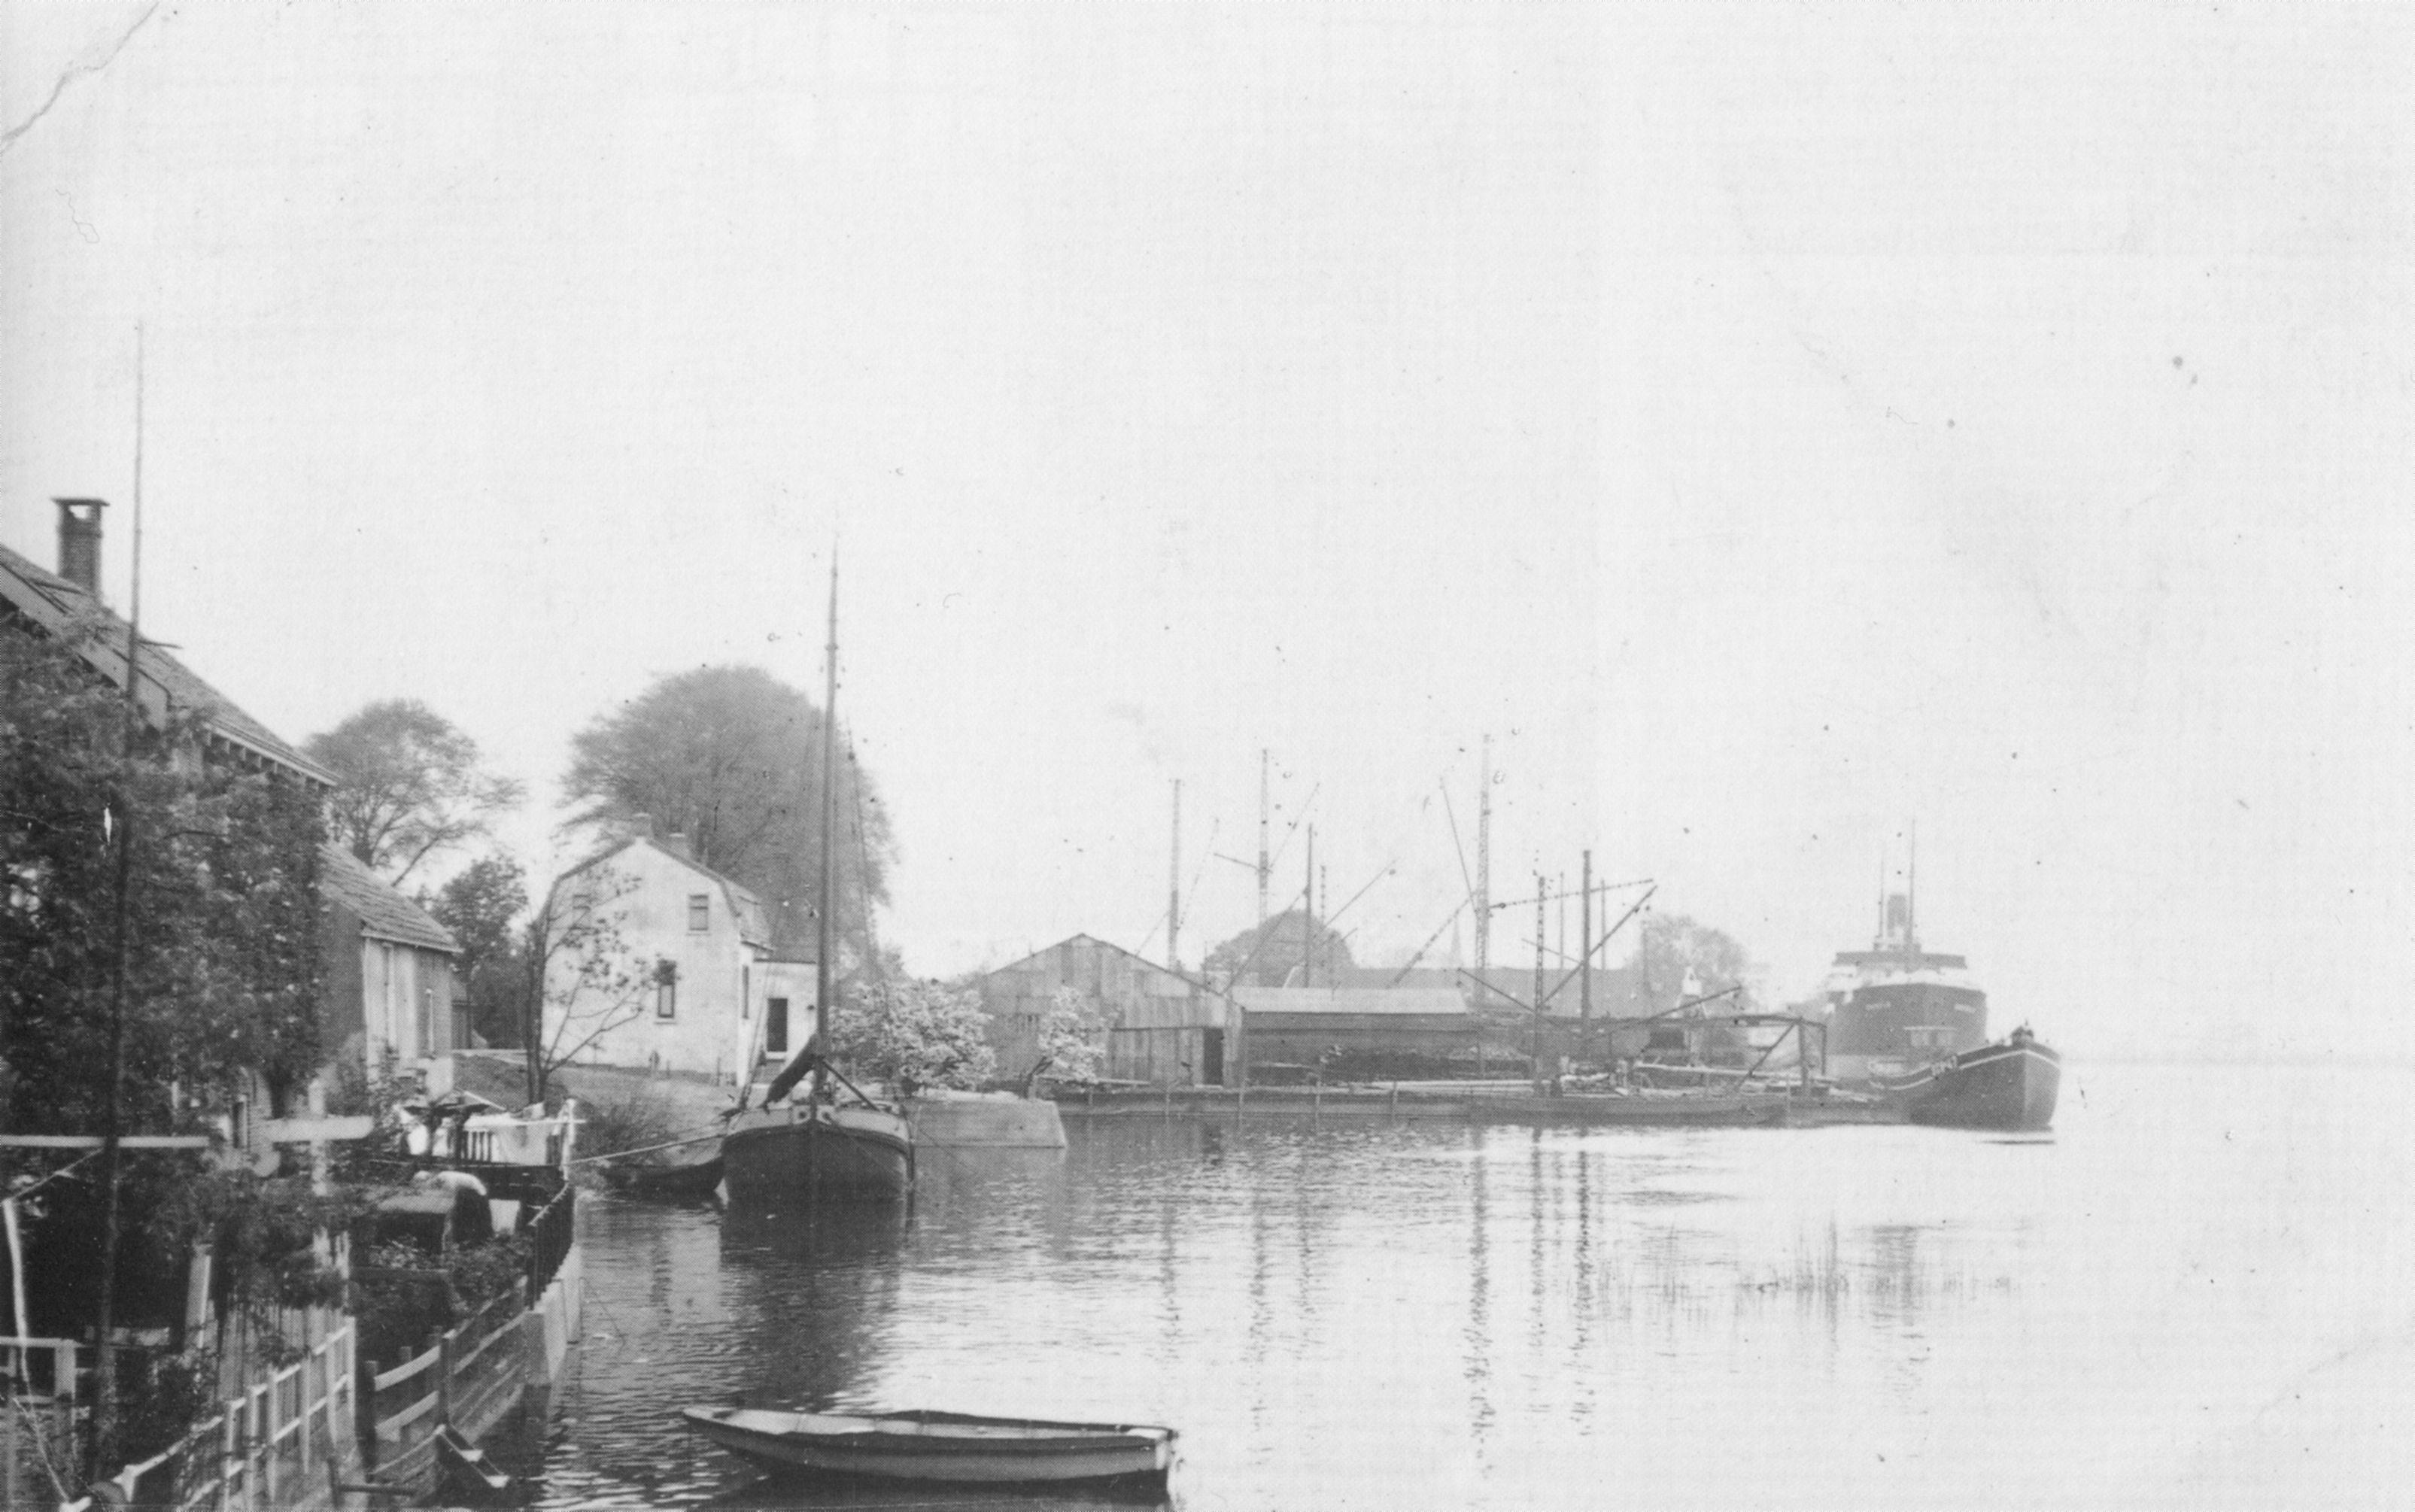 Image: Vuyk's shipyard in the early years (1900)